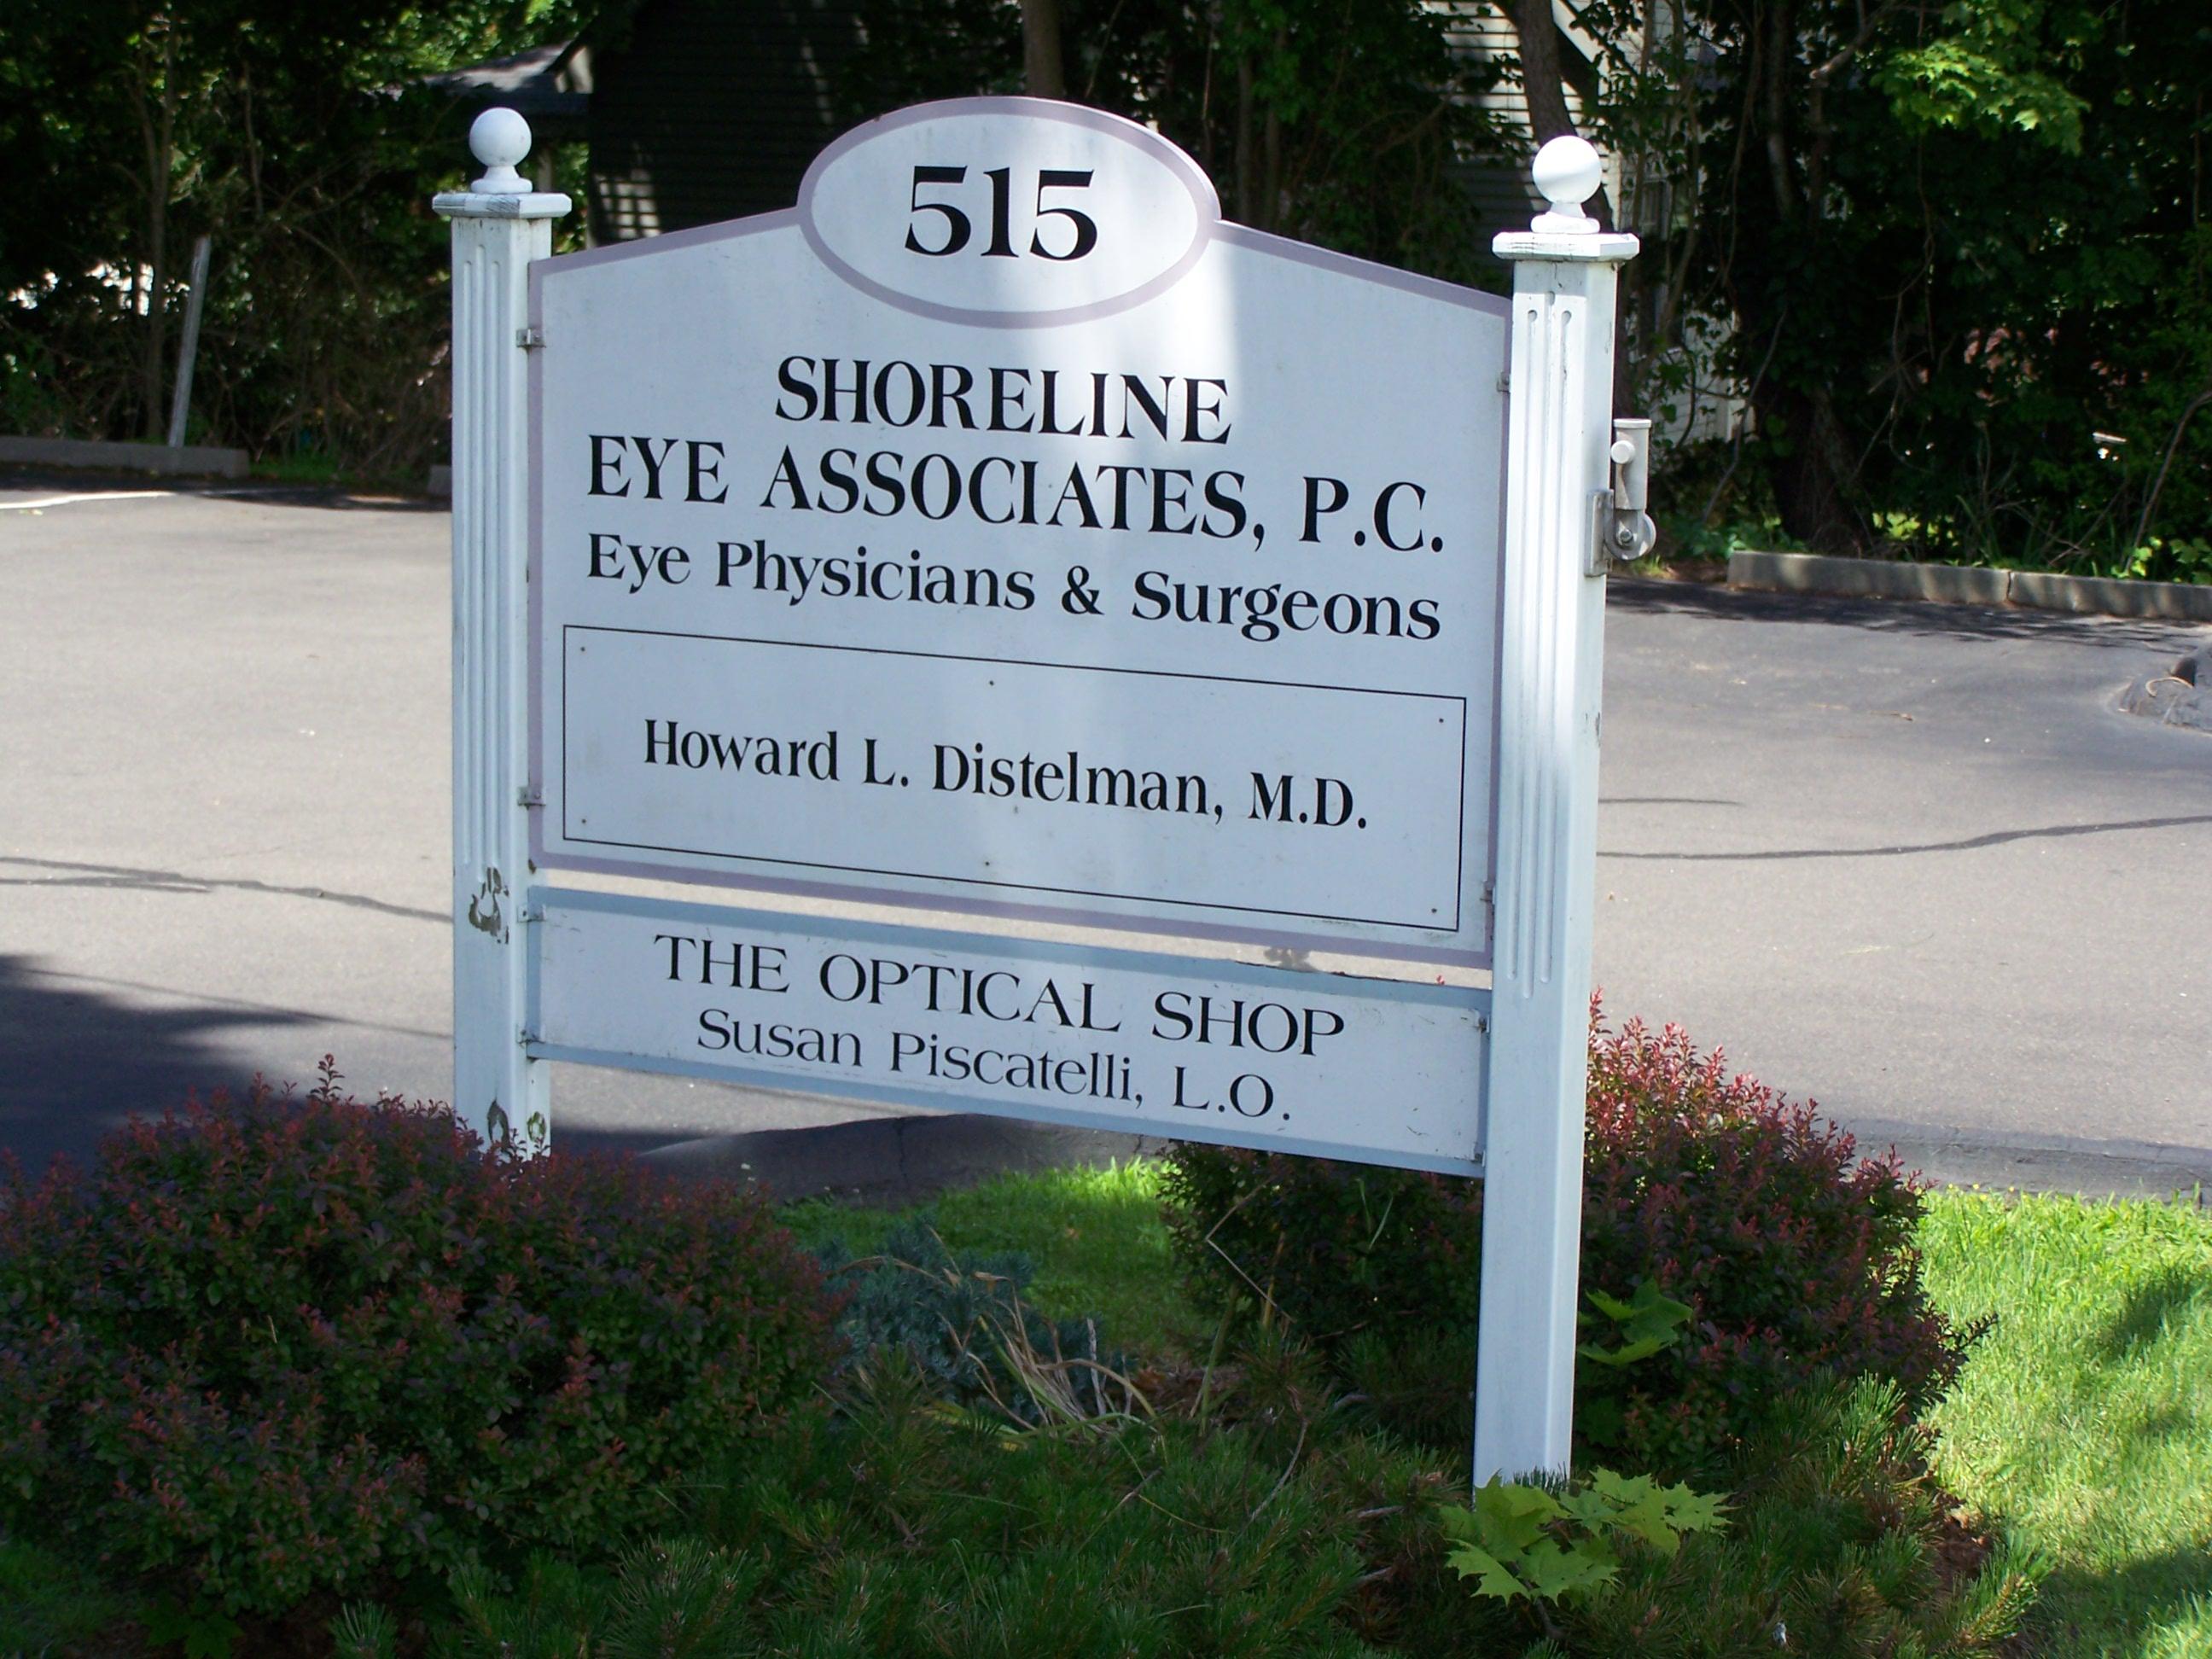 Shoreline Eye Associates, P.C. image 0